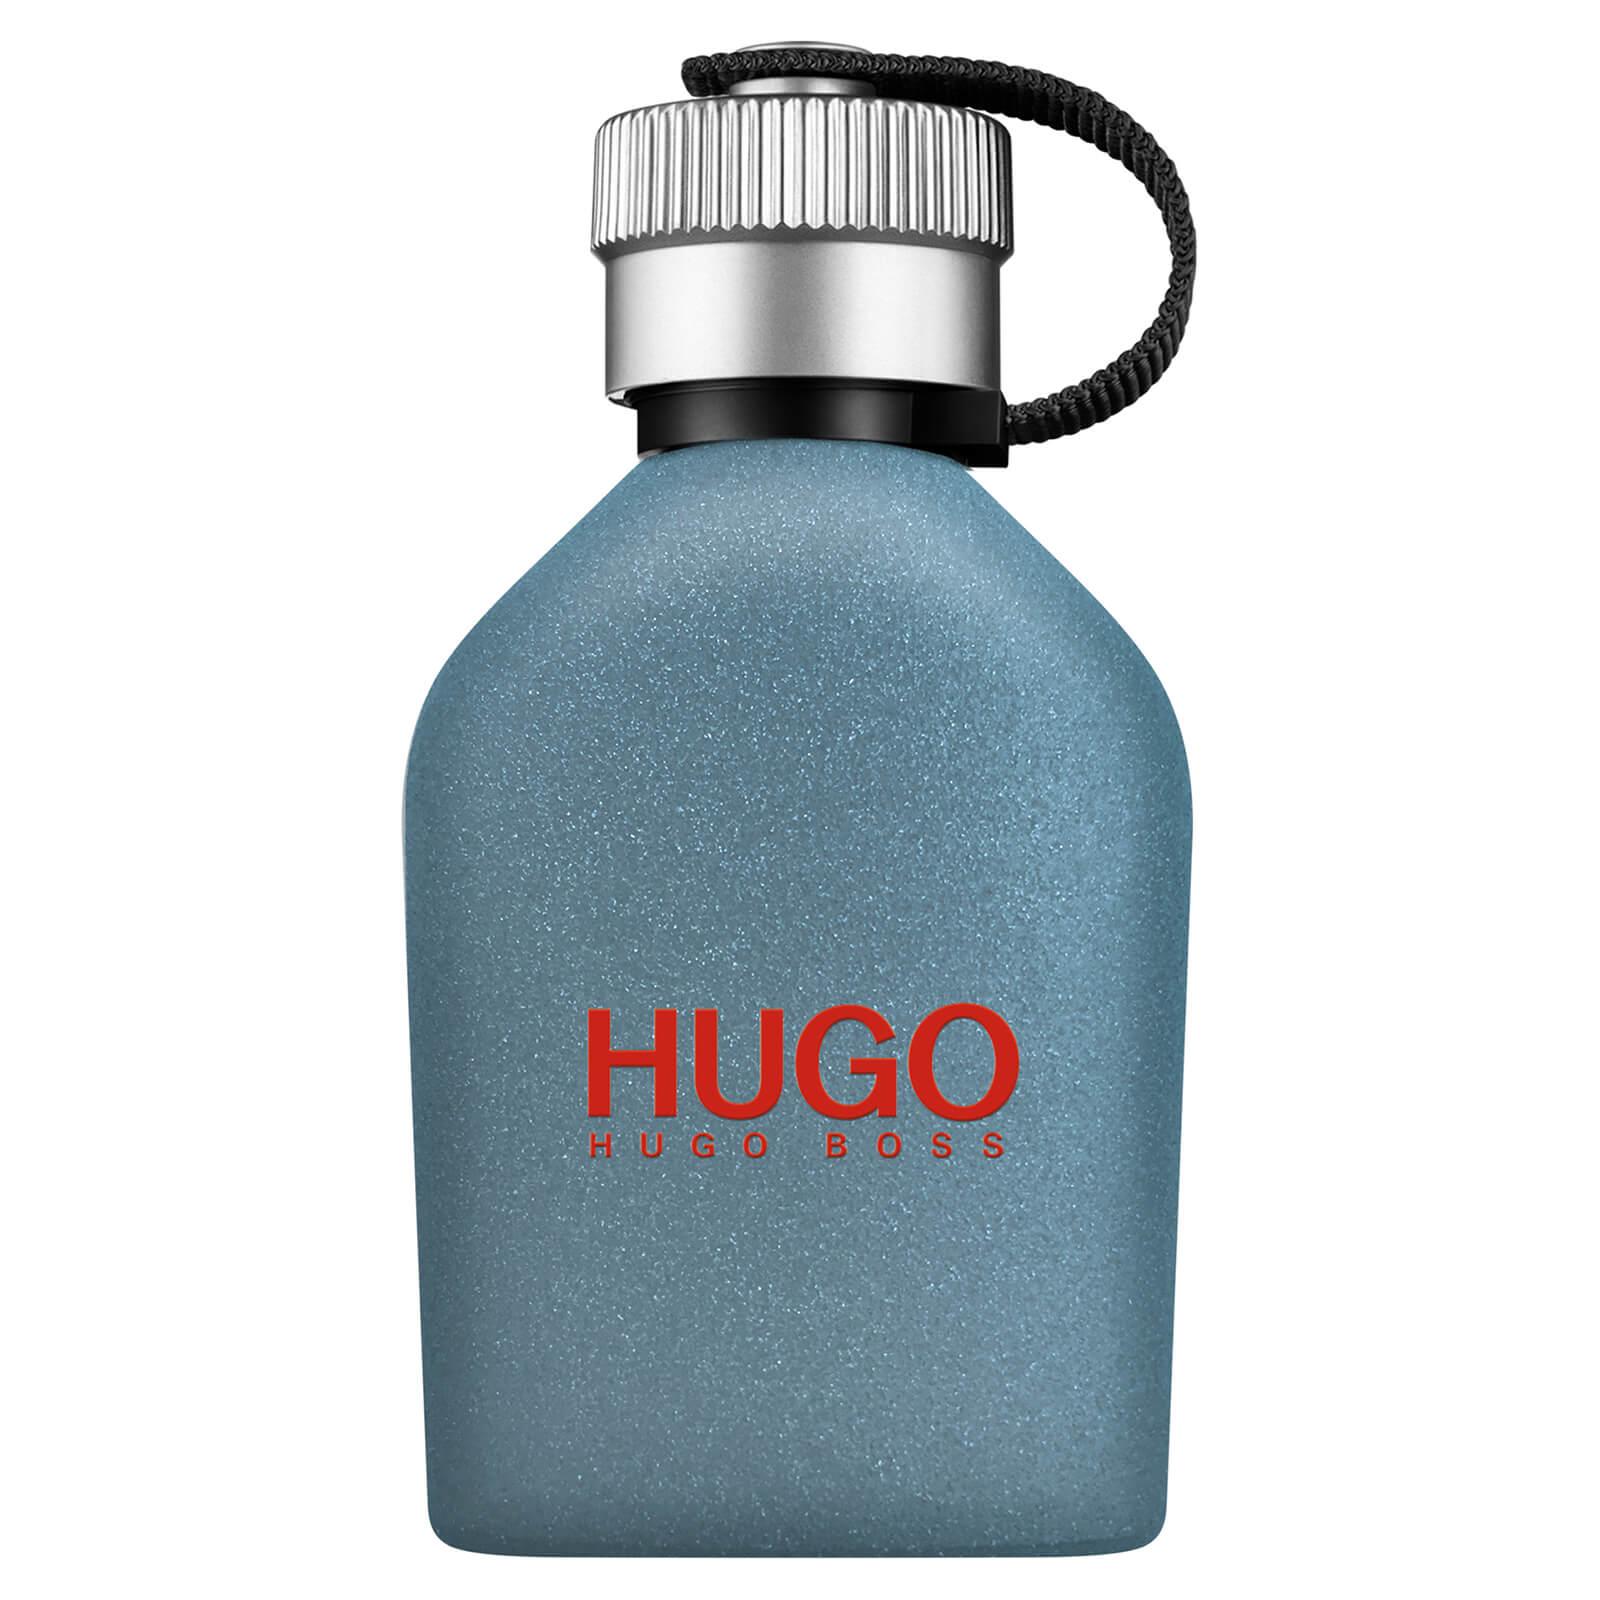 Hugo Boss Hugo Urban Journey Eau De Toilette Limited Edition 75ml